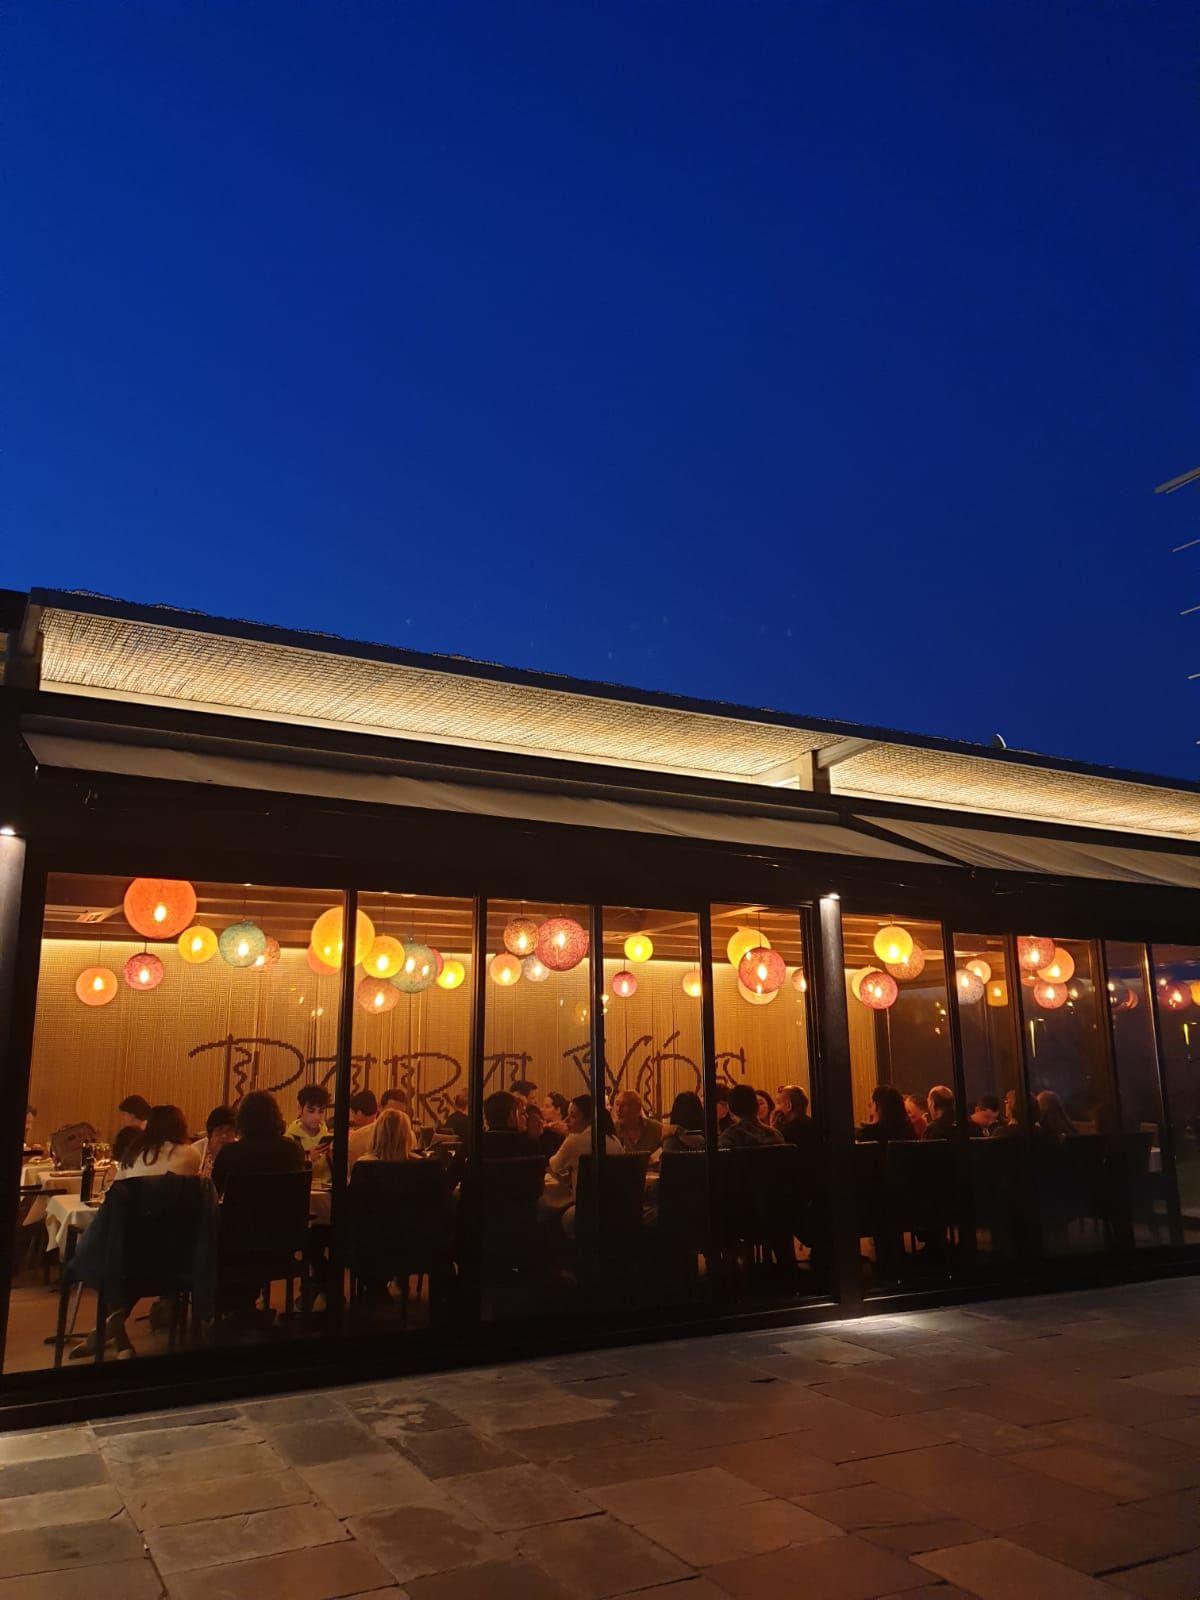 Restaurante argentino situado en Playafels